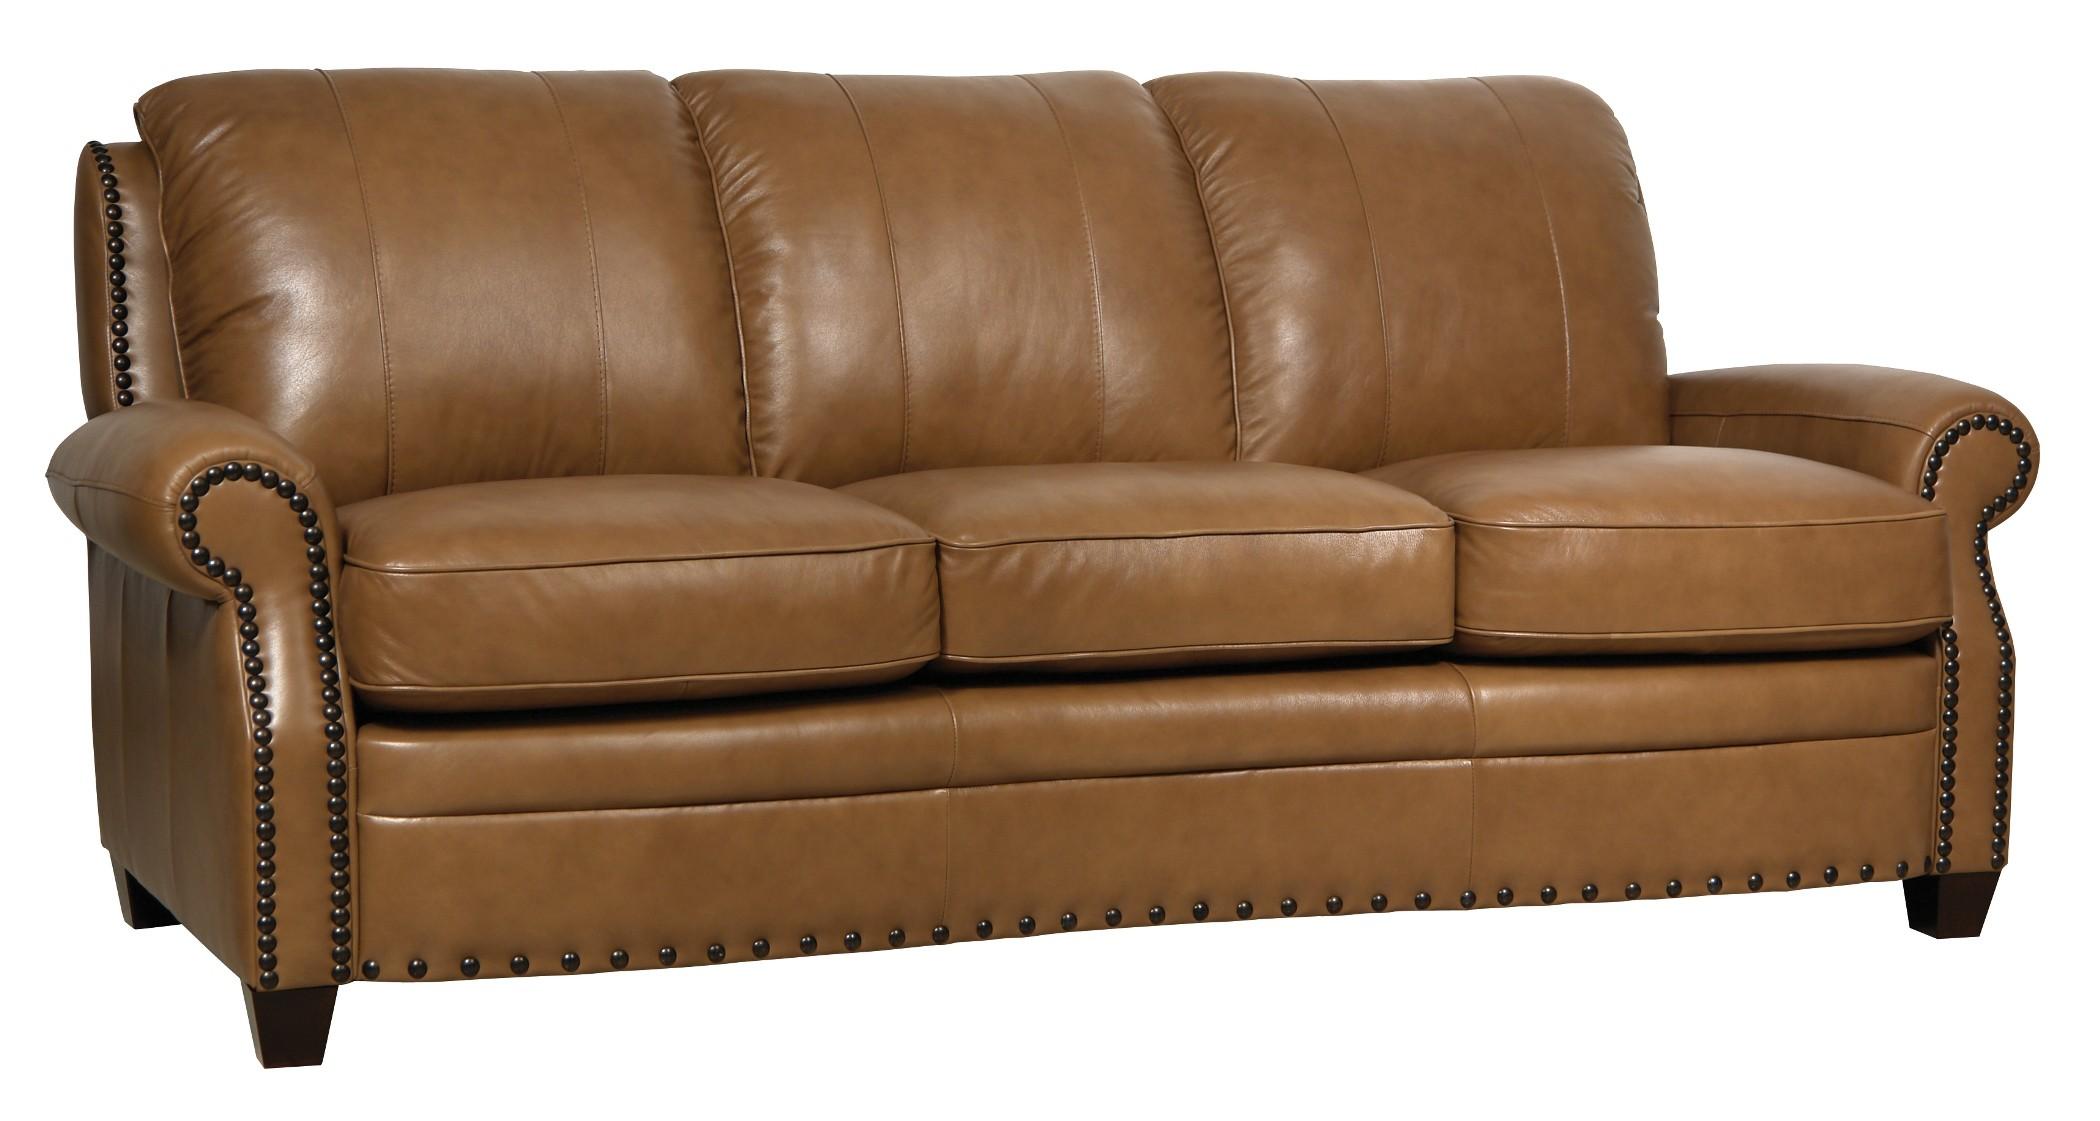 Bennett Italian Leather Sofa from Luke Leather  Coleman